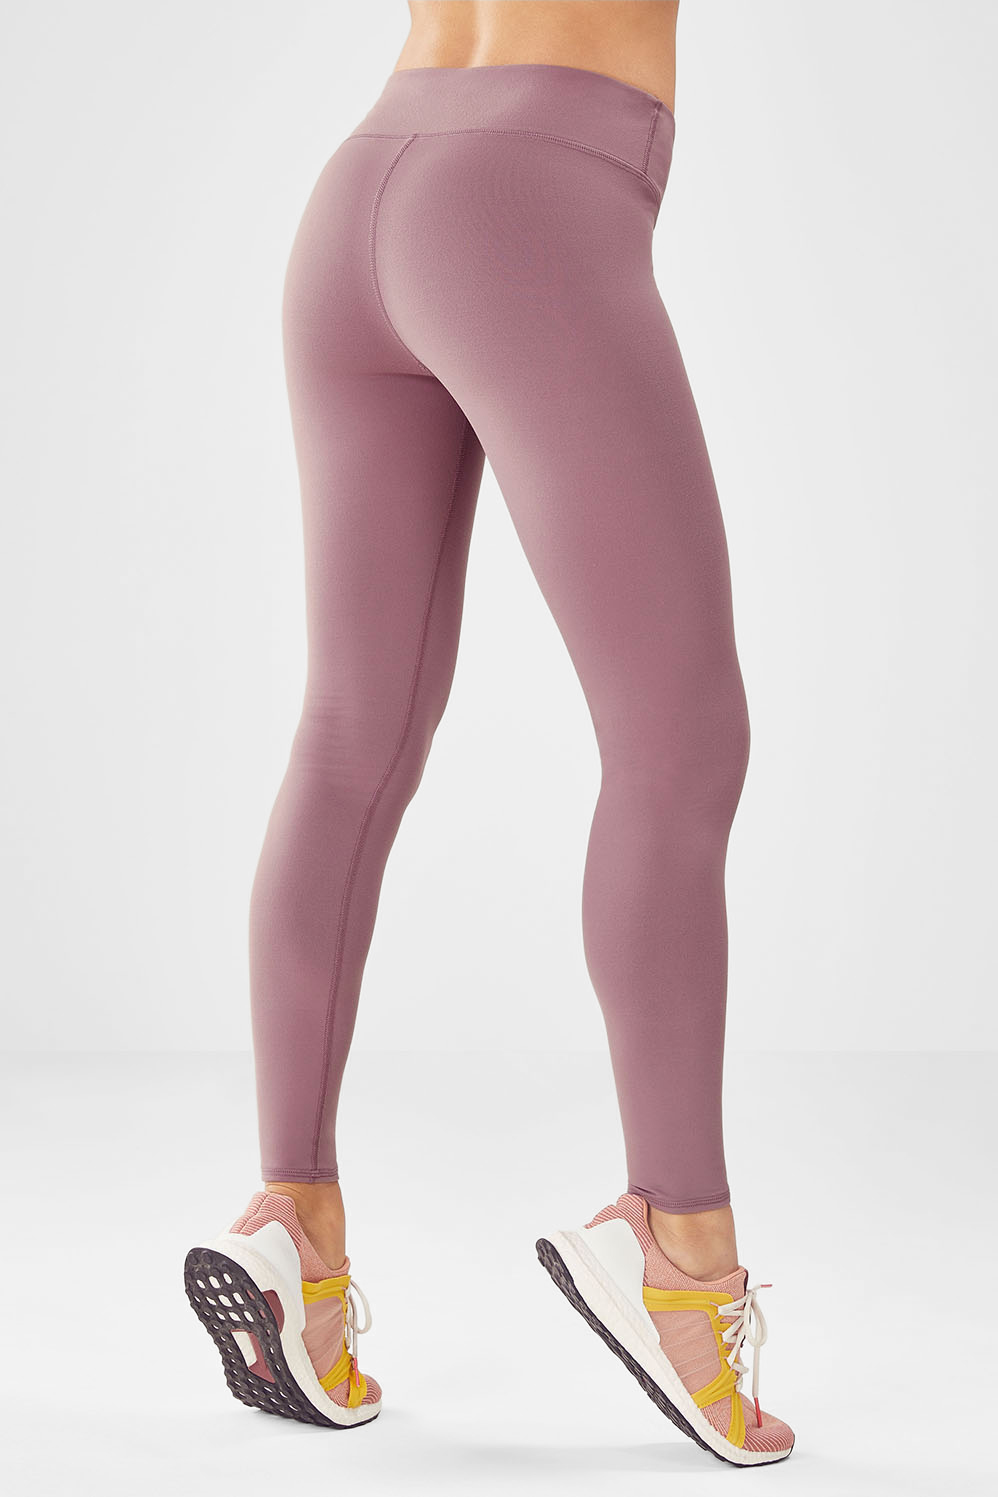 68f3010752d4b Salar Solid PowerHold® Leggings - Fabletics